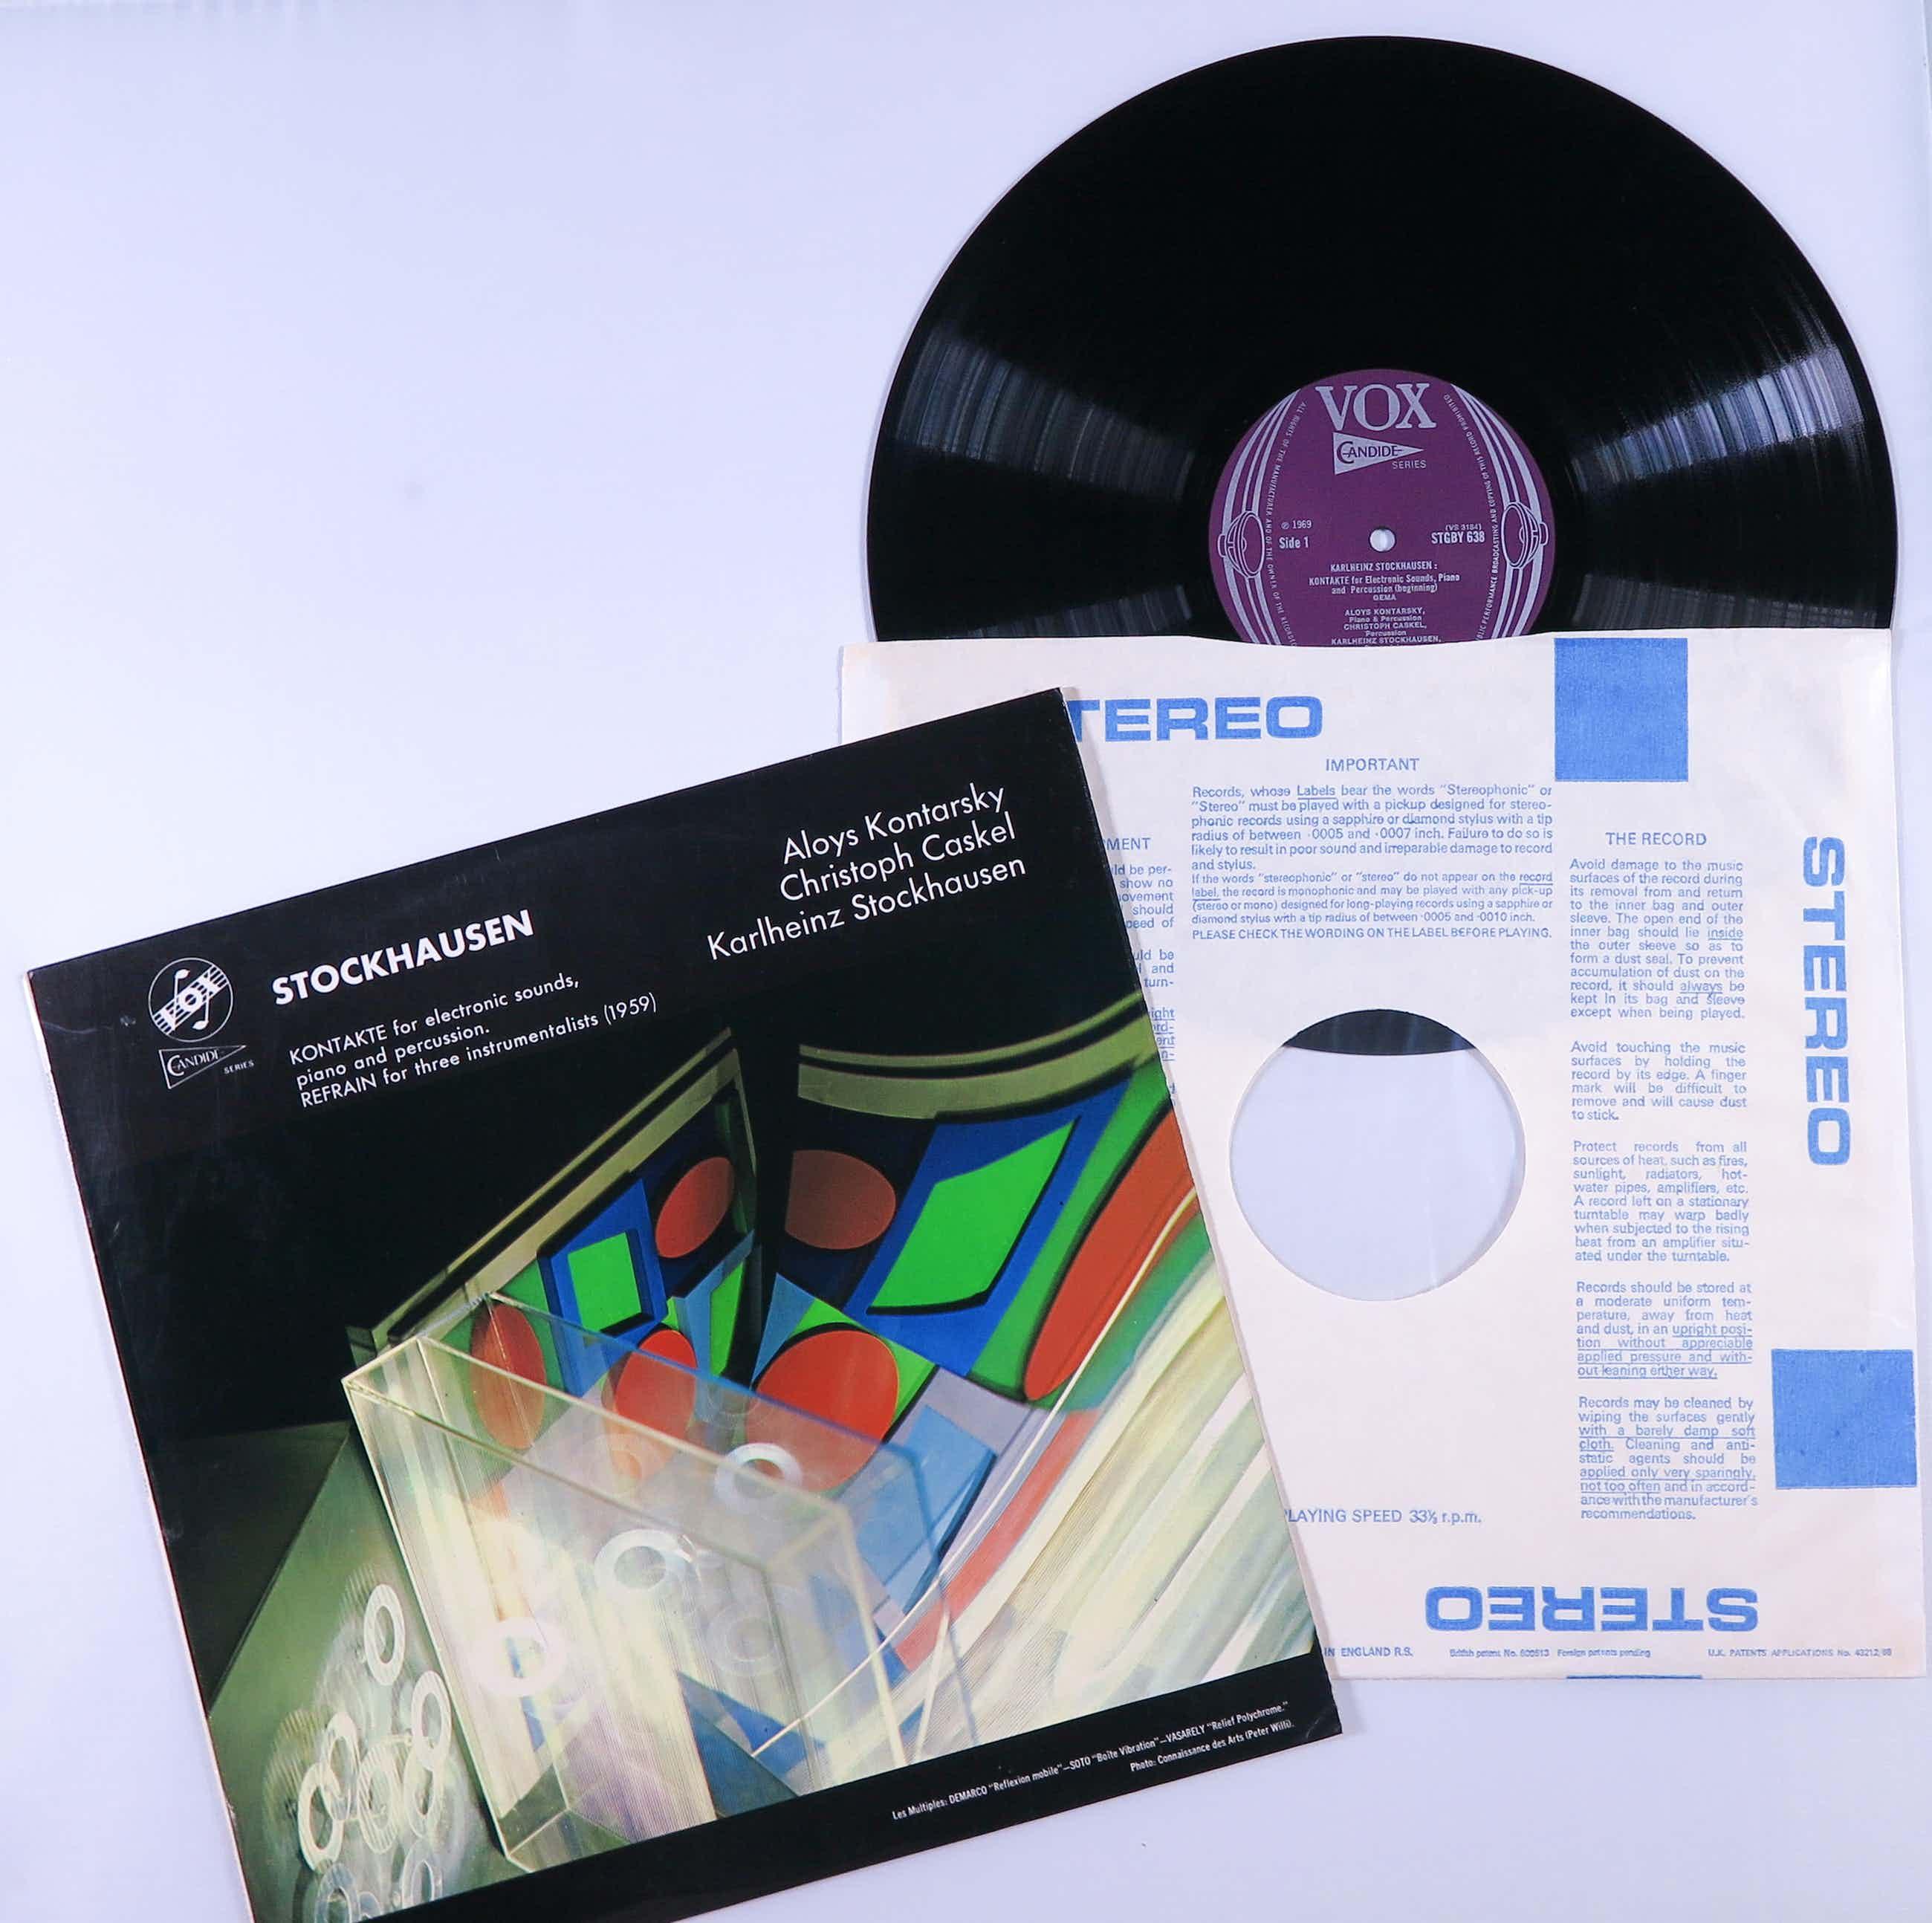 Karlheinz Stockhausen - Kontakte For Electronic Sounds kopen? Bied vanaf 15!